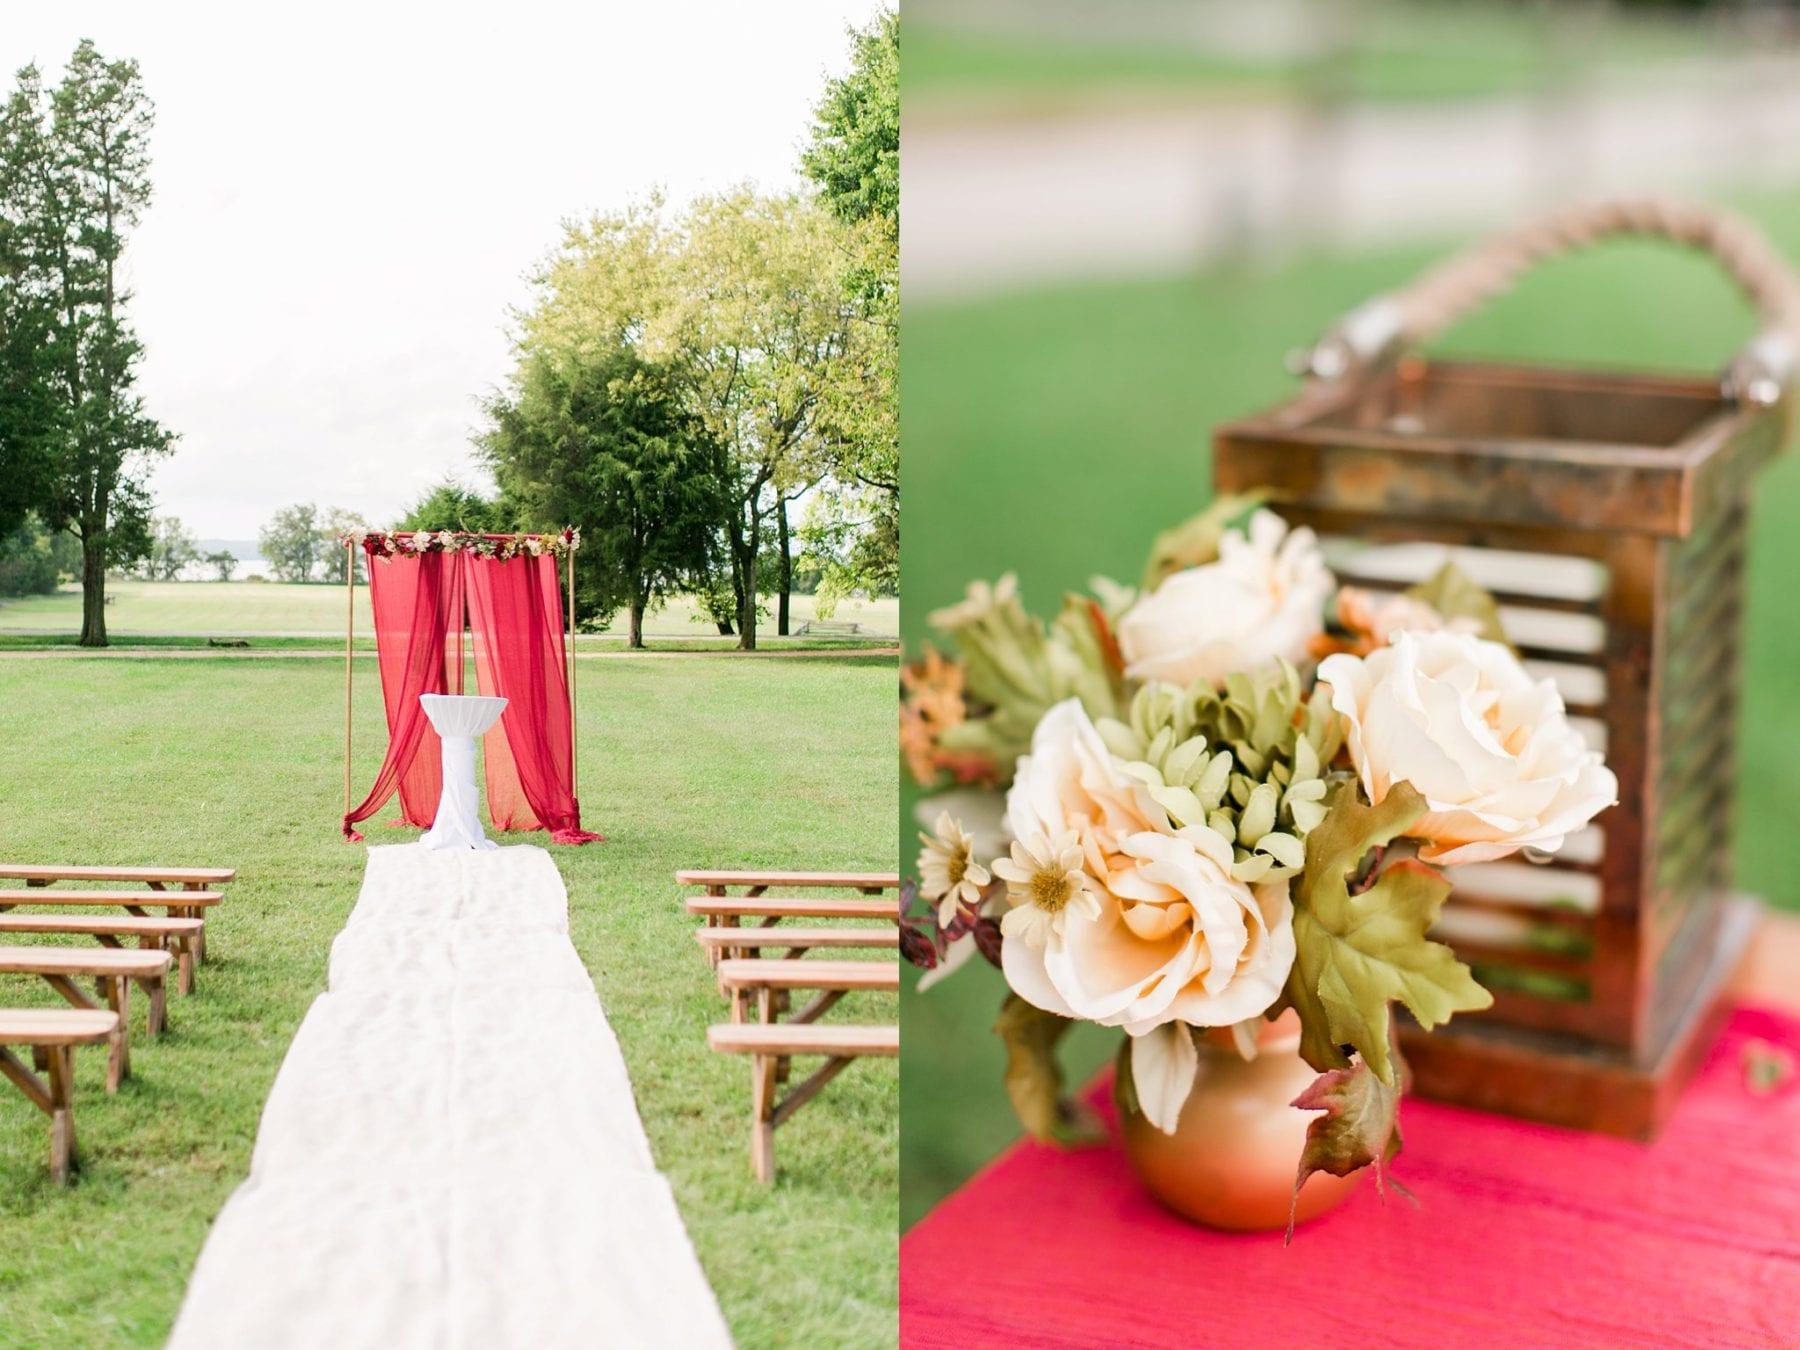 Jefferson Patterson Park Wedding Maryland Wedding Photographer Megan Kelsey Photography Jasmine & Seyi-74.jpg